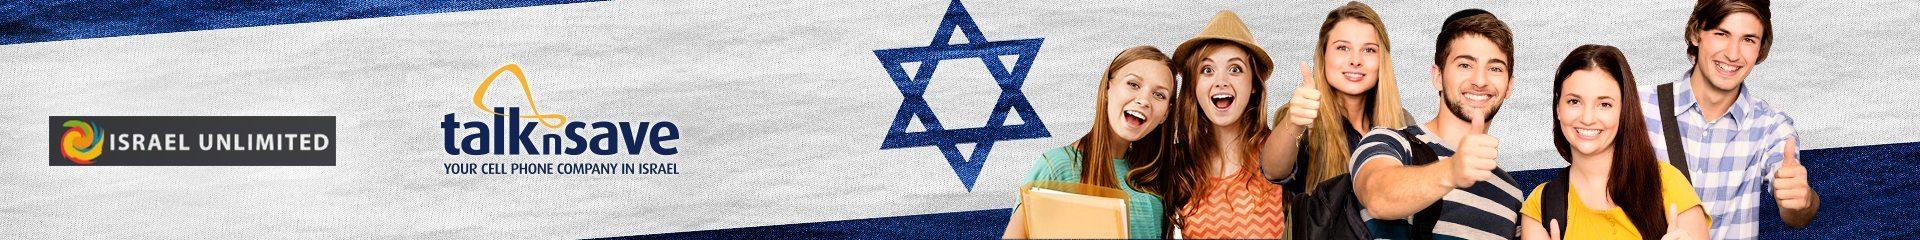 israel-unlimited-banner